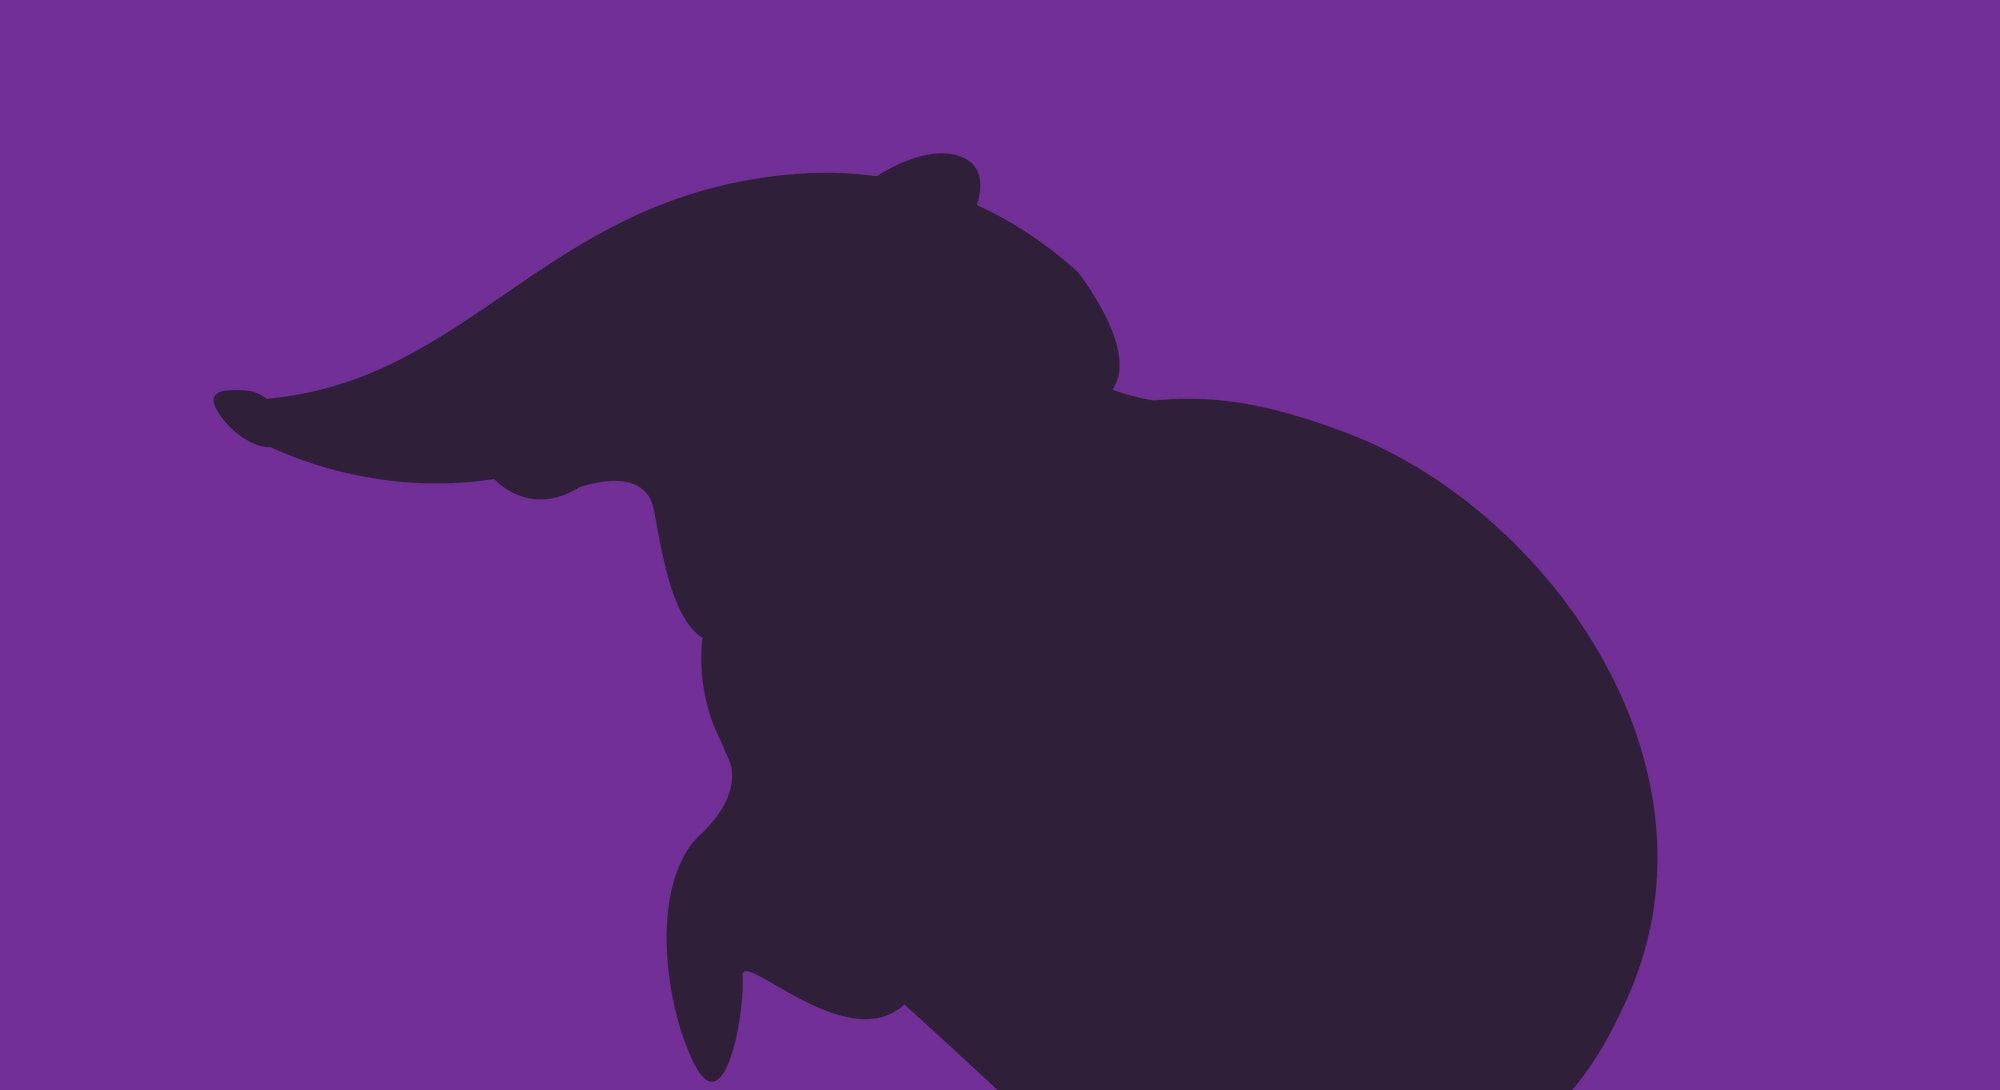 Black and rufous elephant shrew,vector illustration, black silhouette